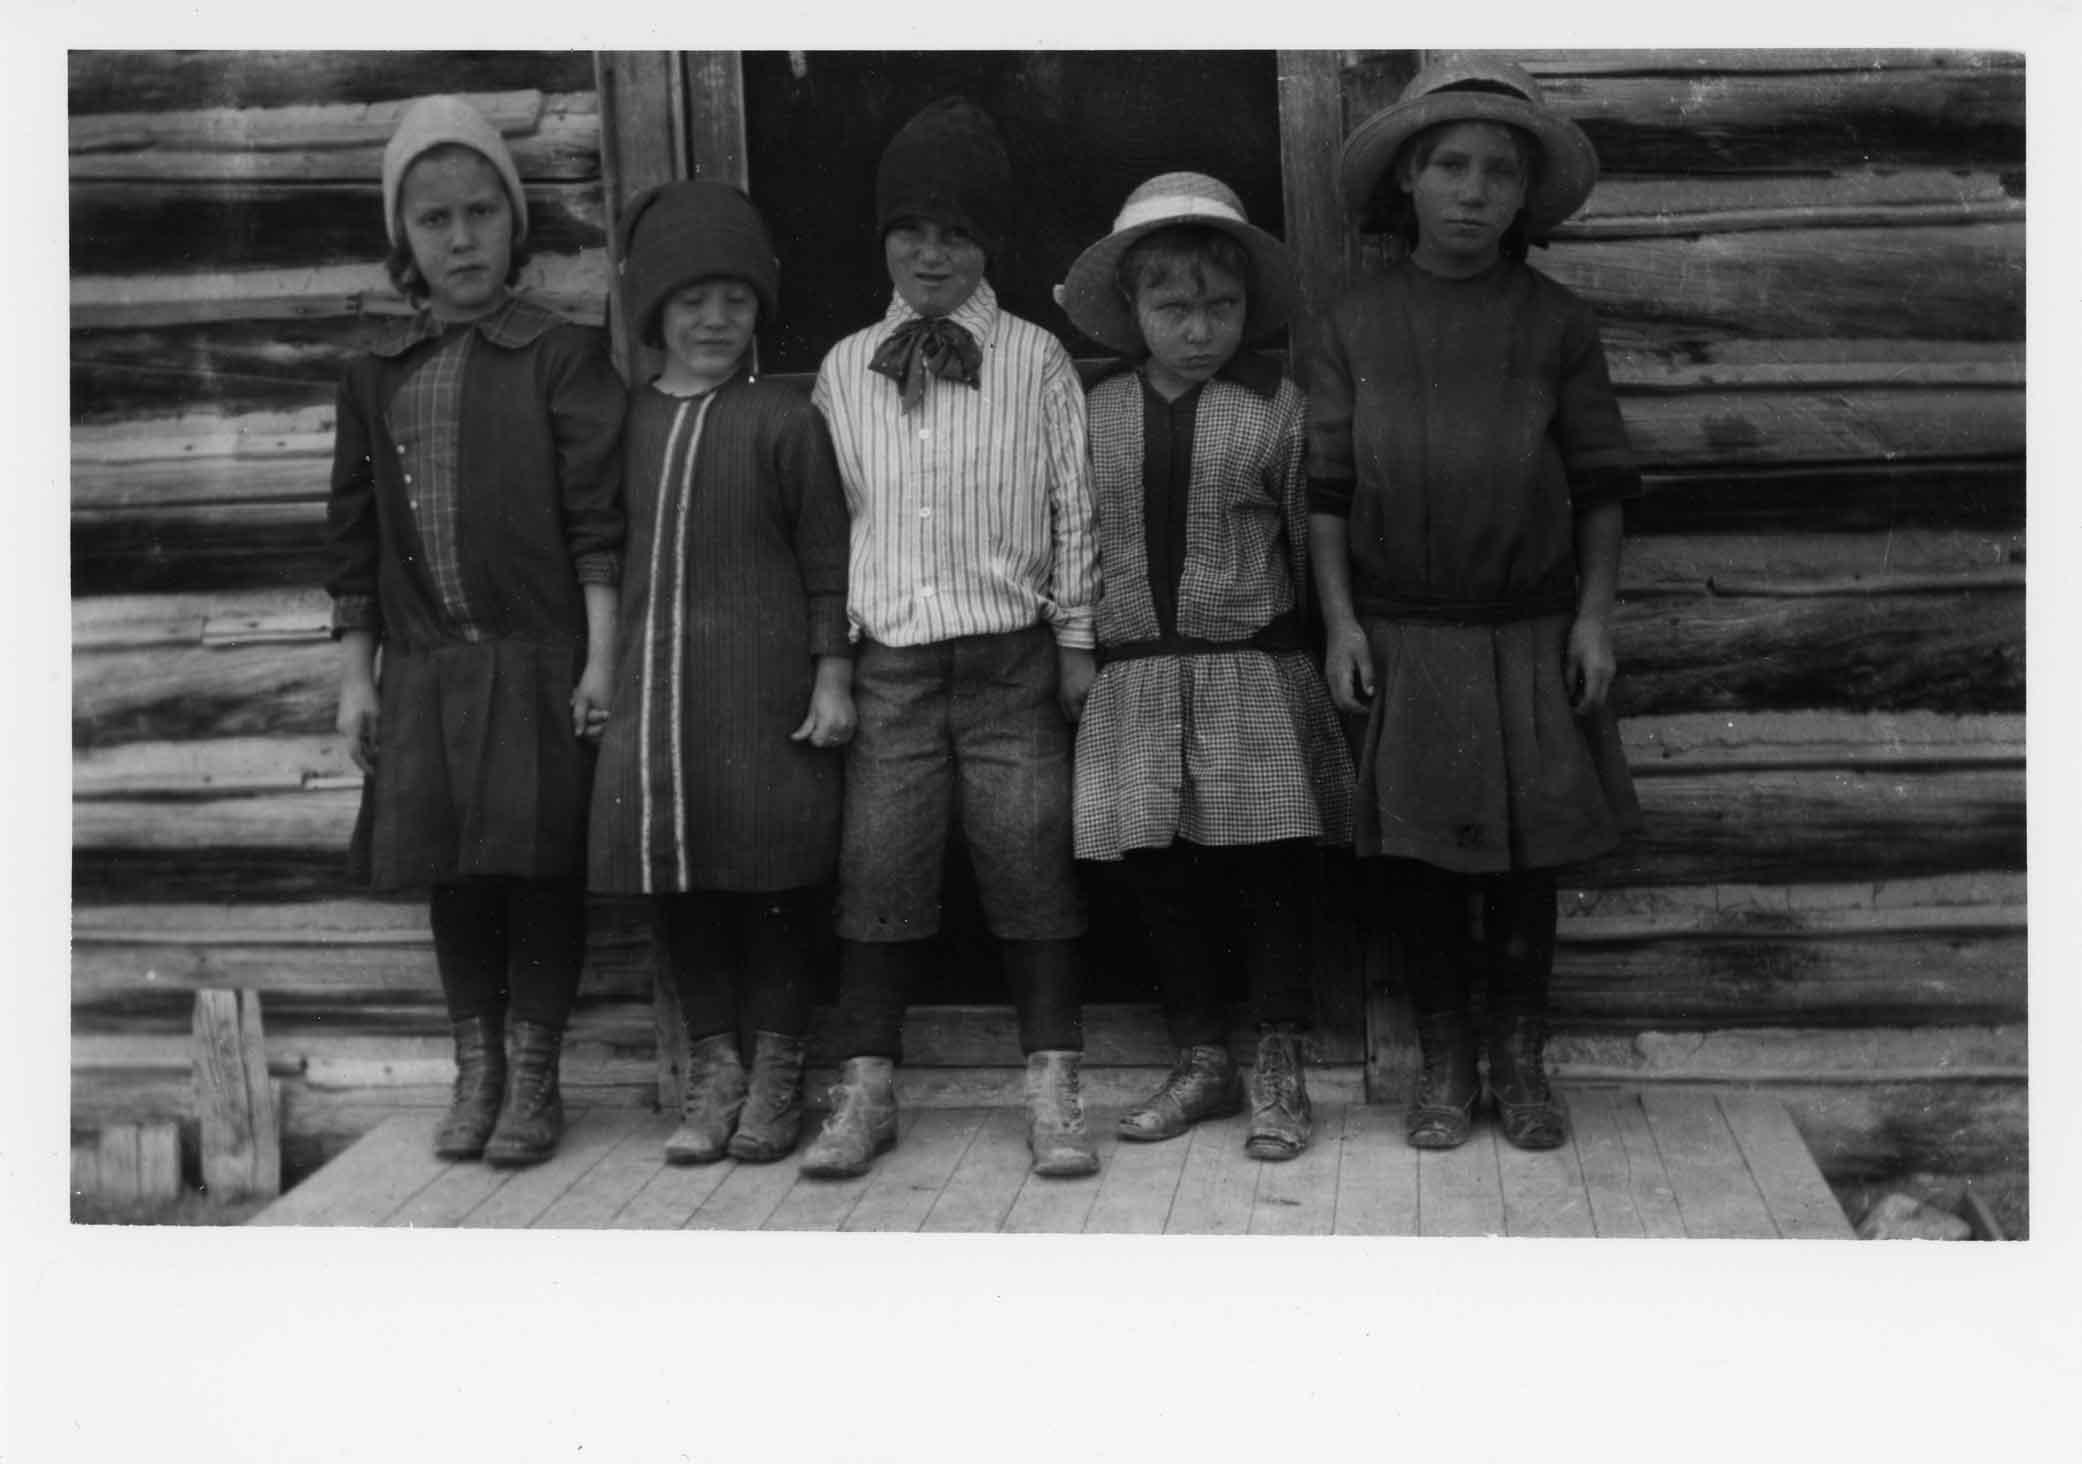 [children at Cushman Indian School]